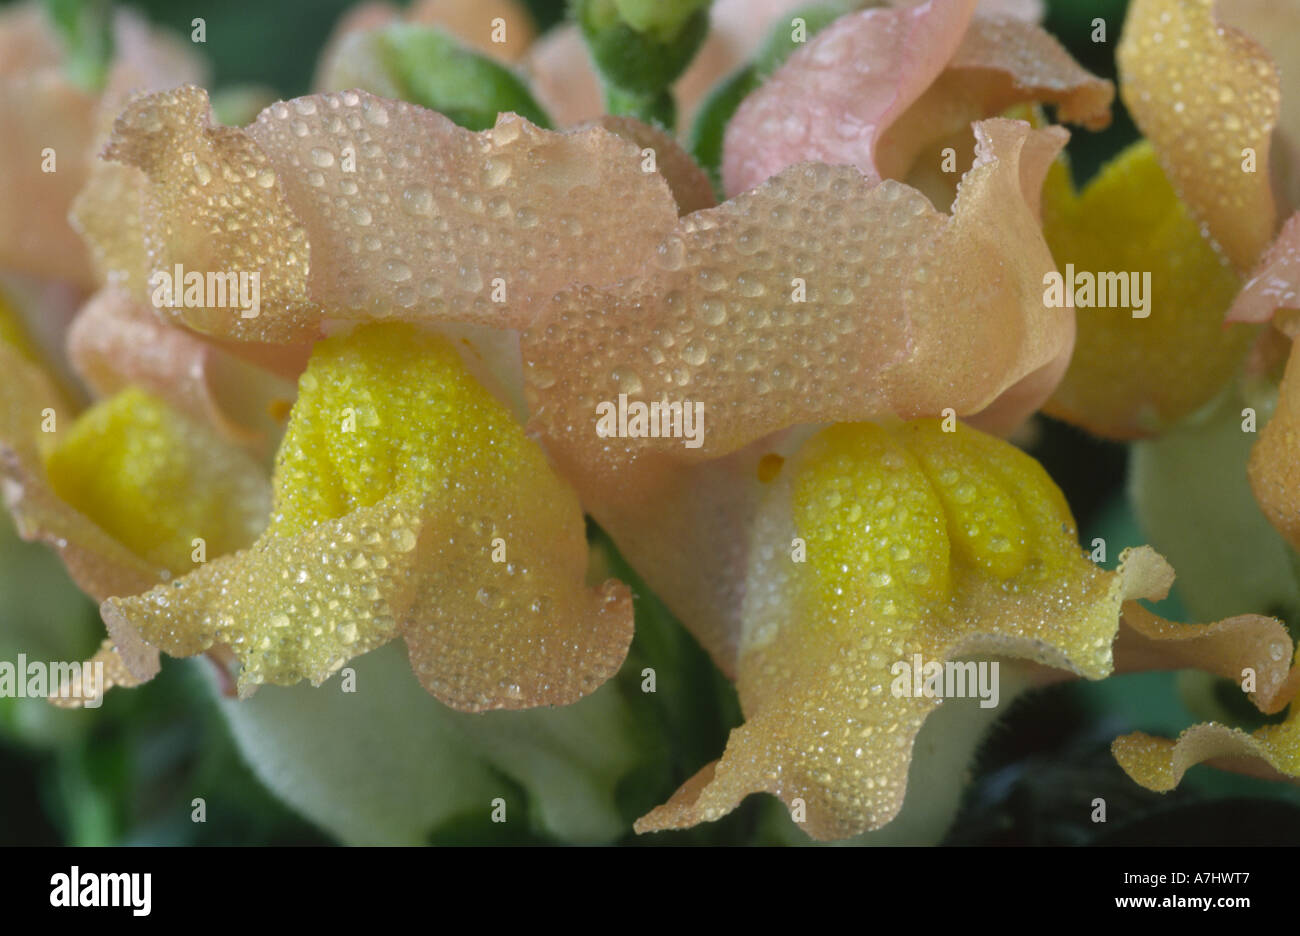 Antirrhinum majus  'Delice' Snapdragon. Stock Photo